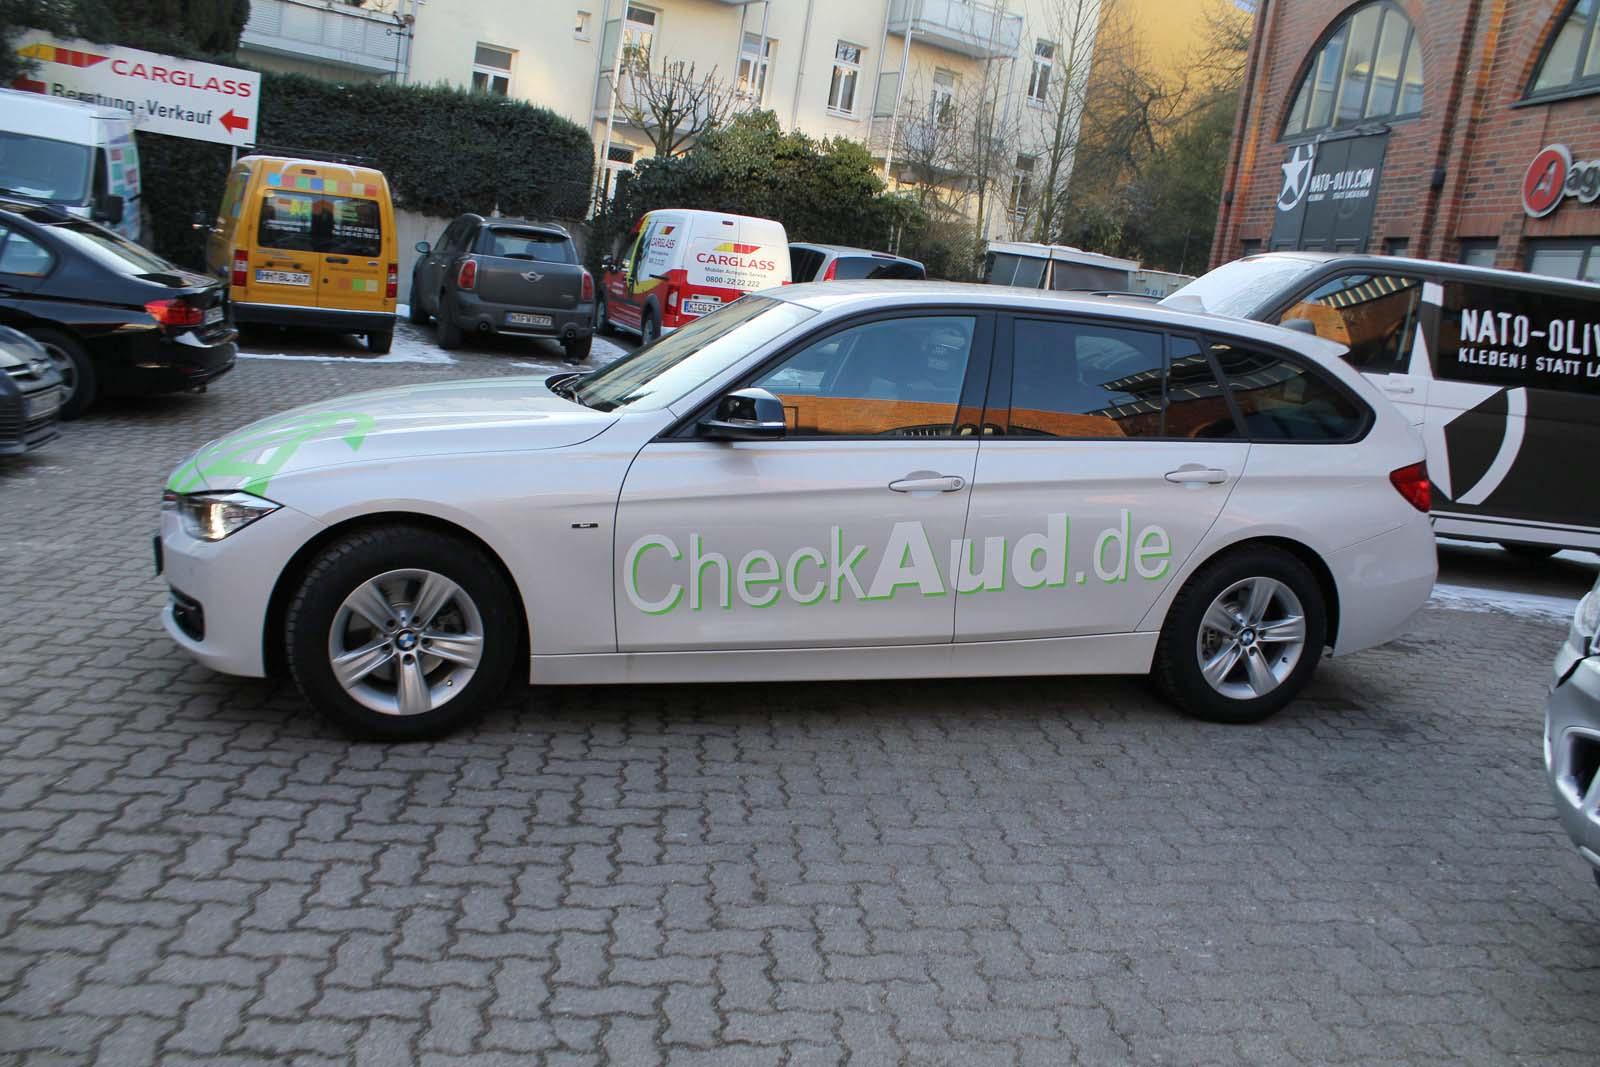 BMW_3ER_RALLYESTREIFEN_WEISS_GRUEN_MATT_MIT_BRANDING_19